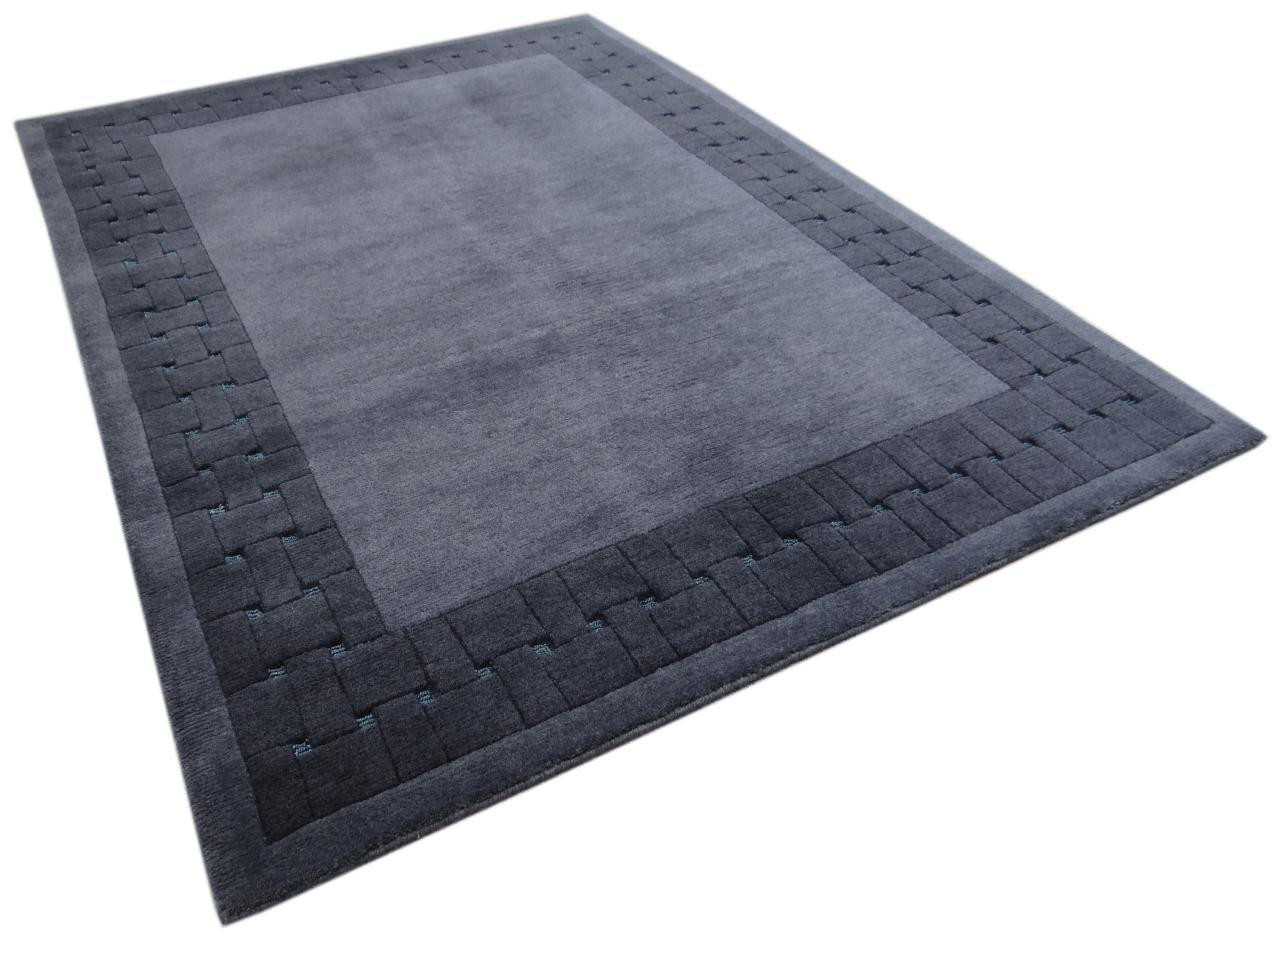 Zen 1 7700 tapis bordures n 34200 200x140cm - Tapis 200x140 ...